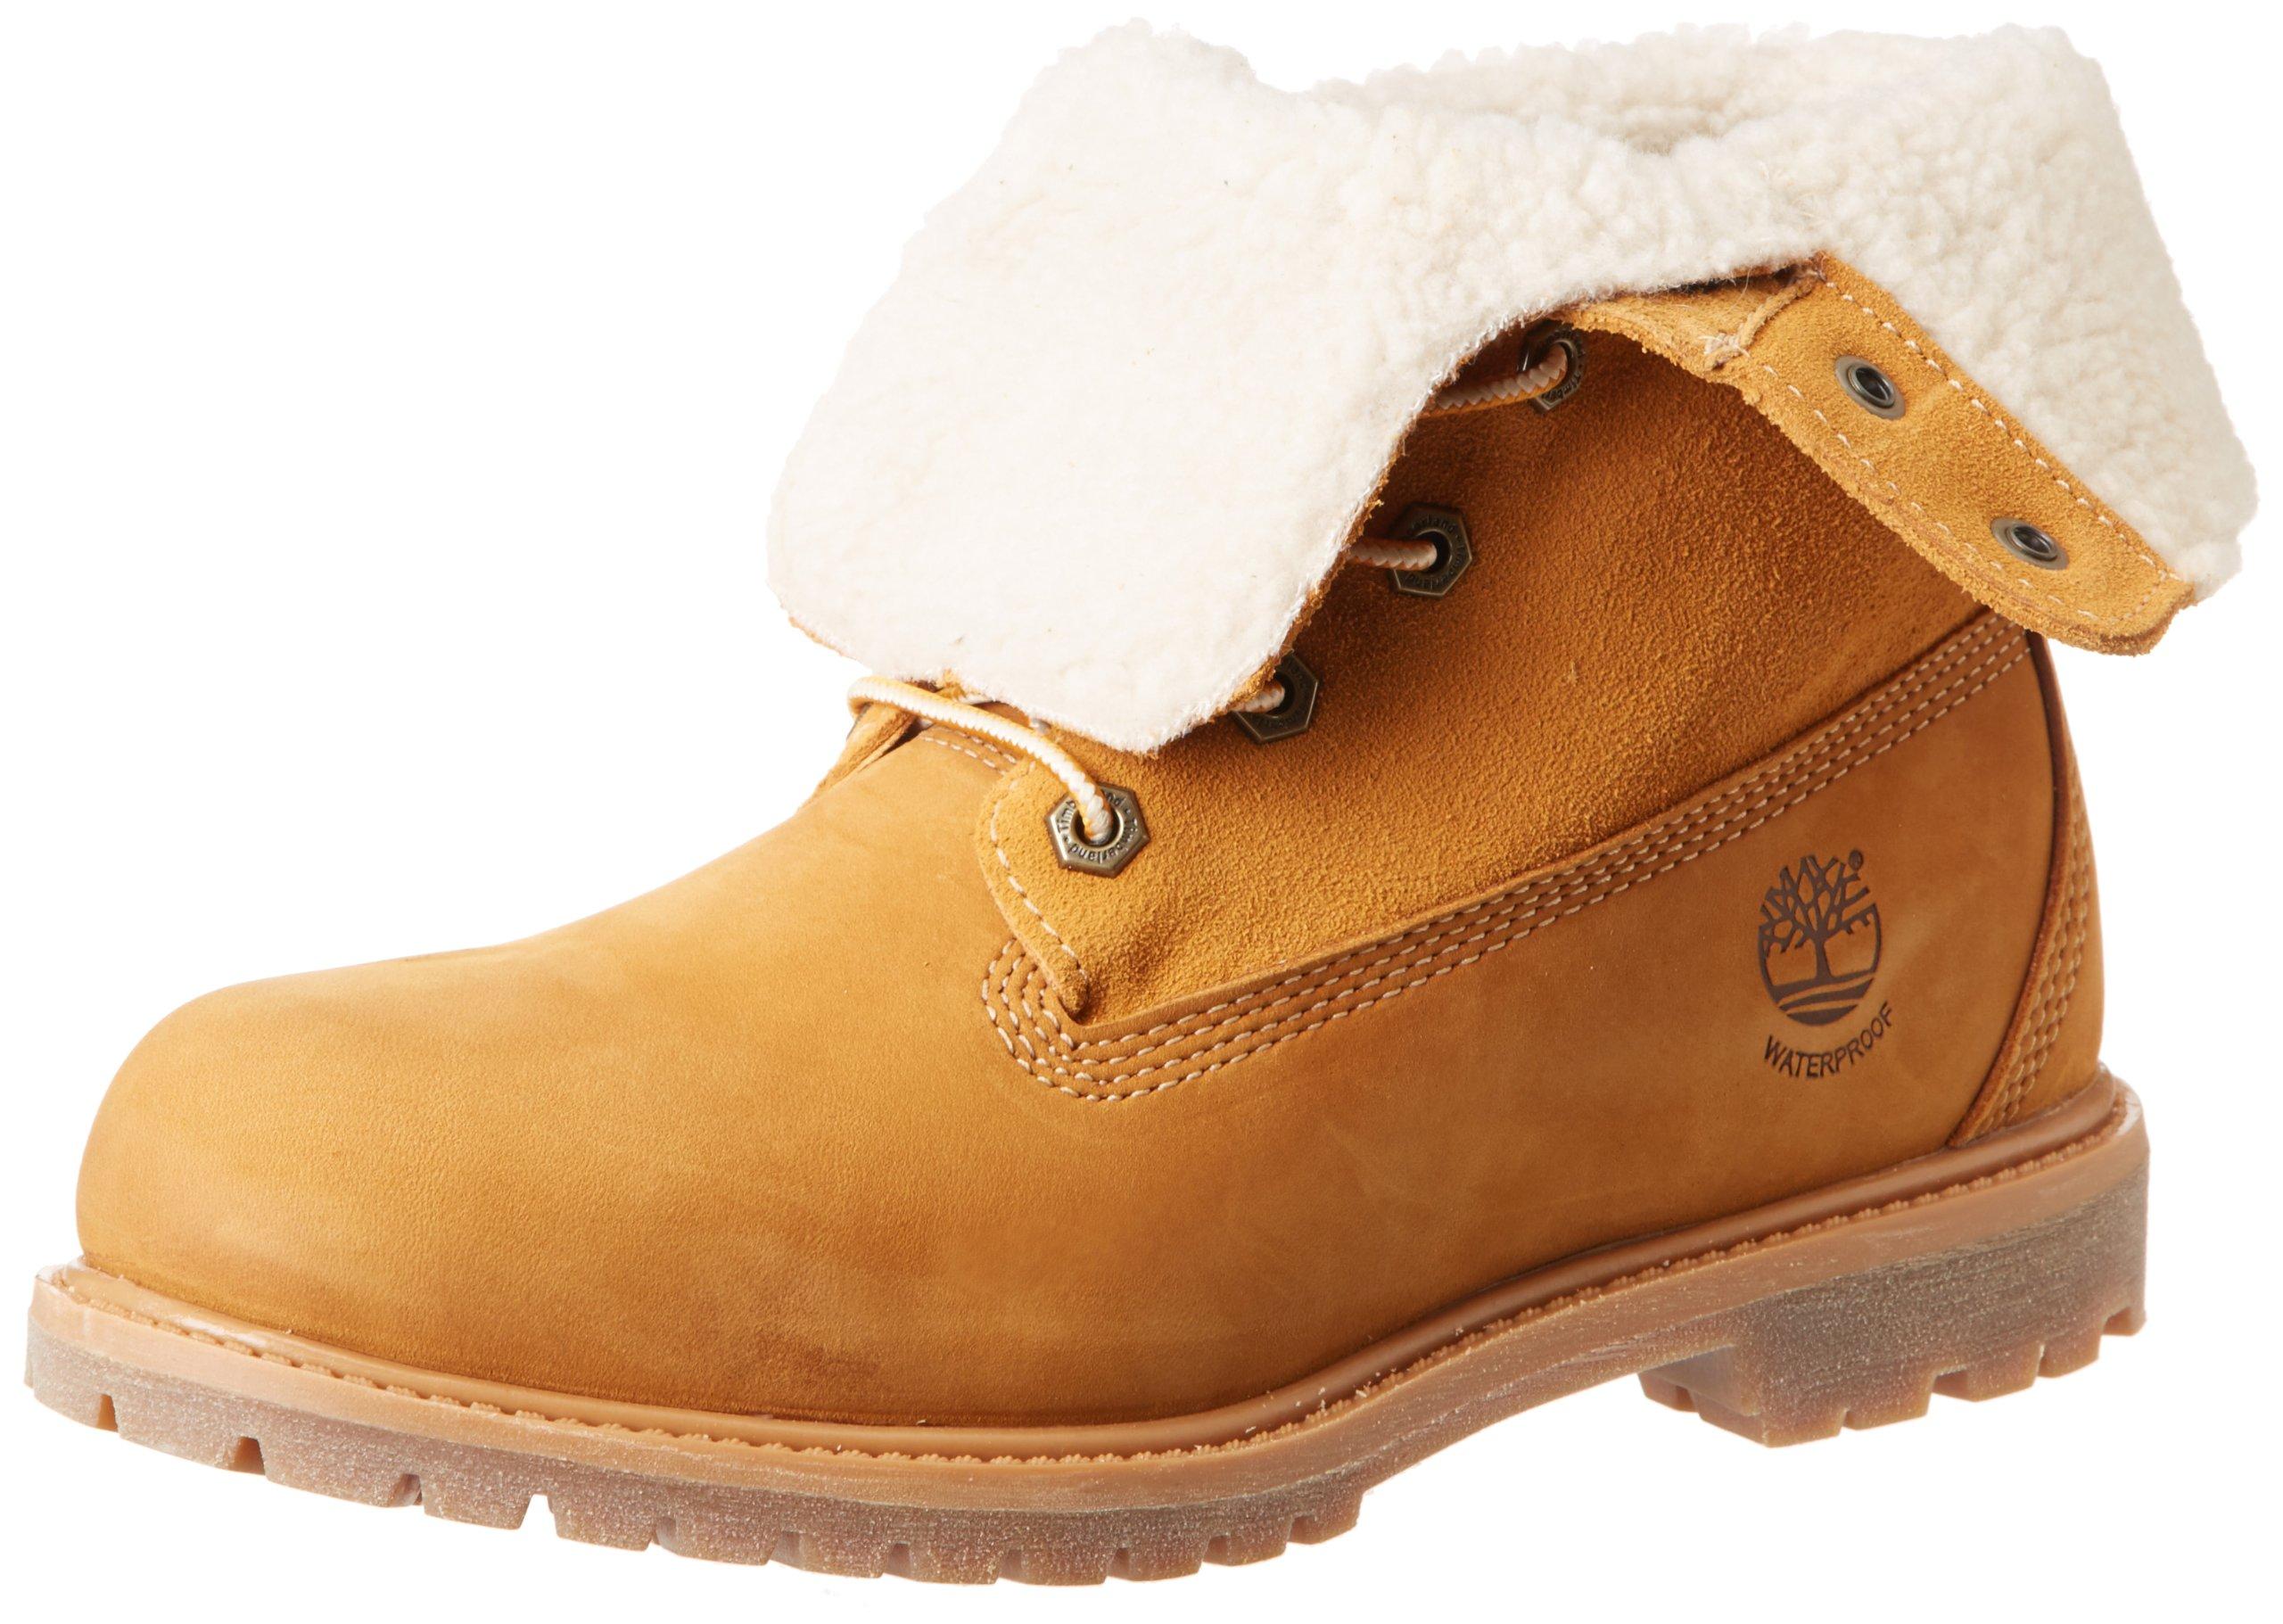 Timberland Women's Teddy Fleece Fold Down WP Boot,Wheat,8 M US